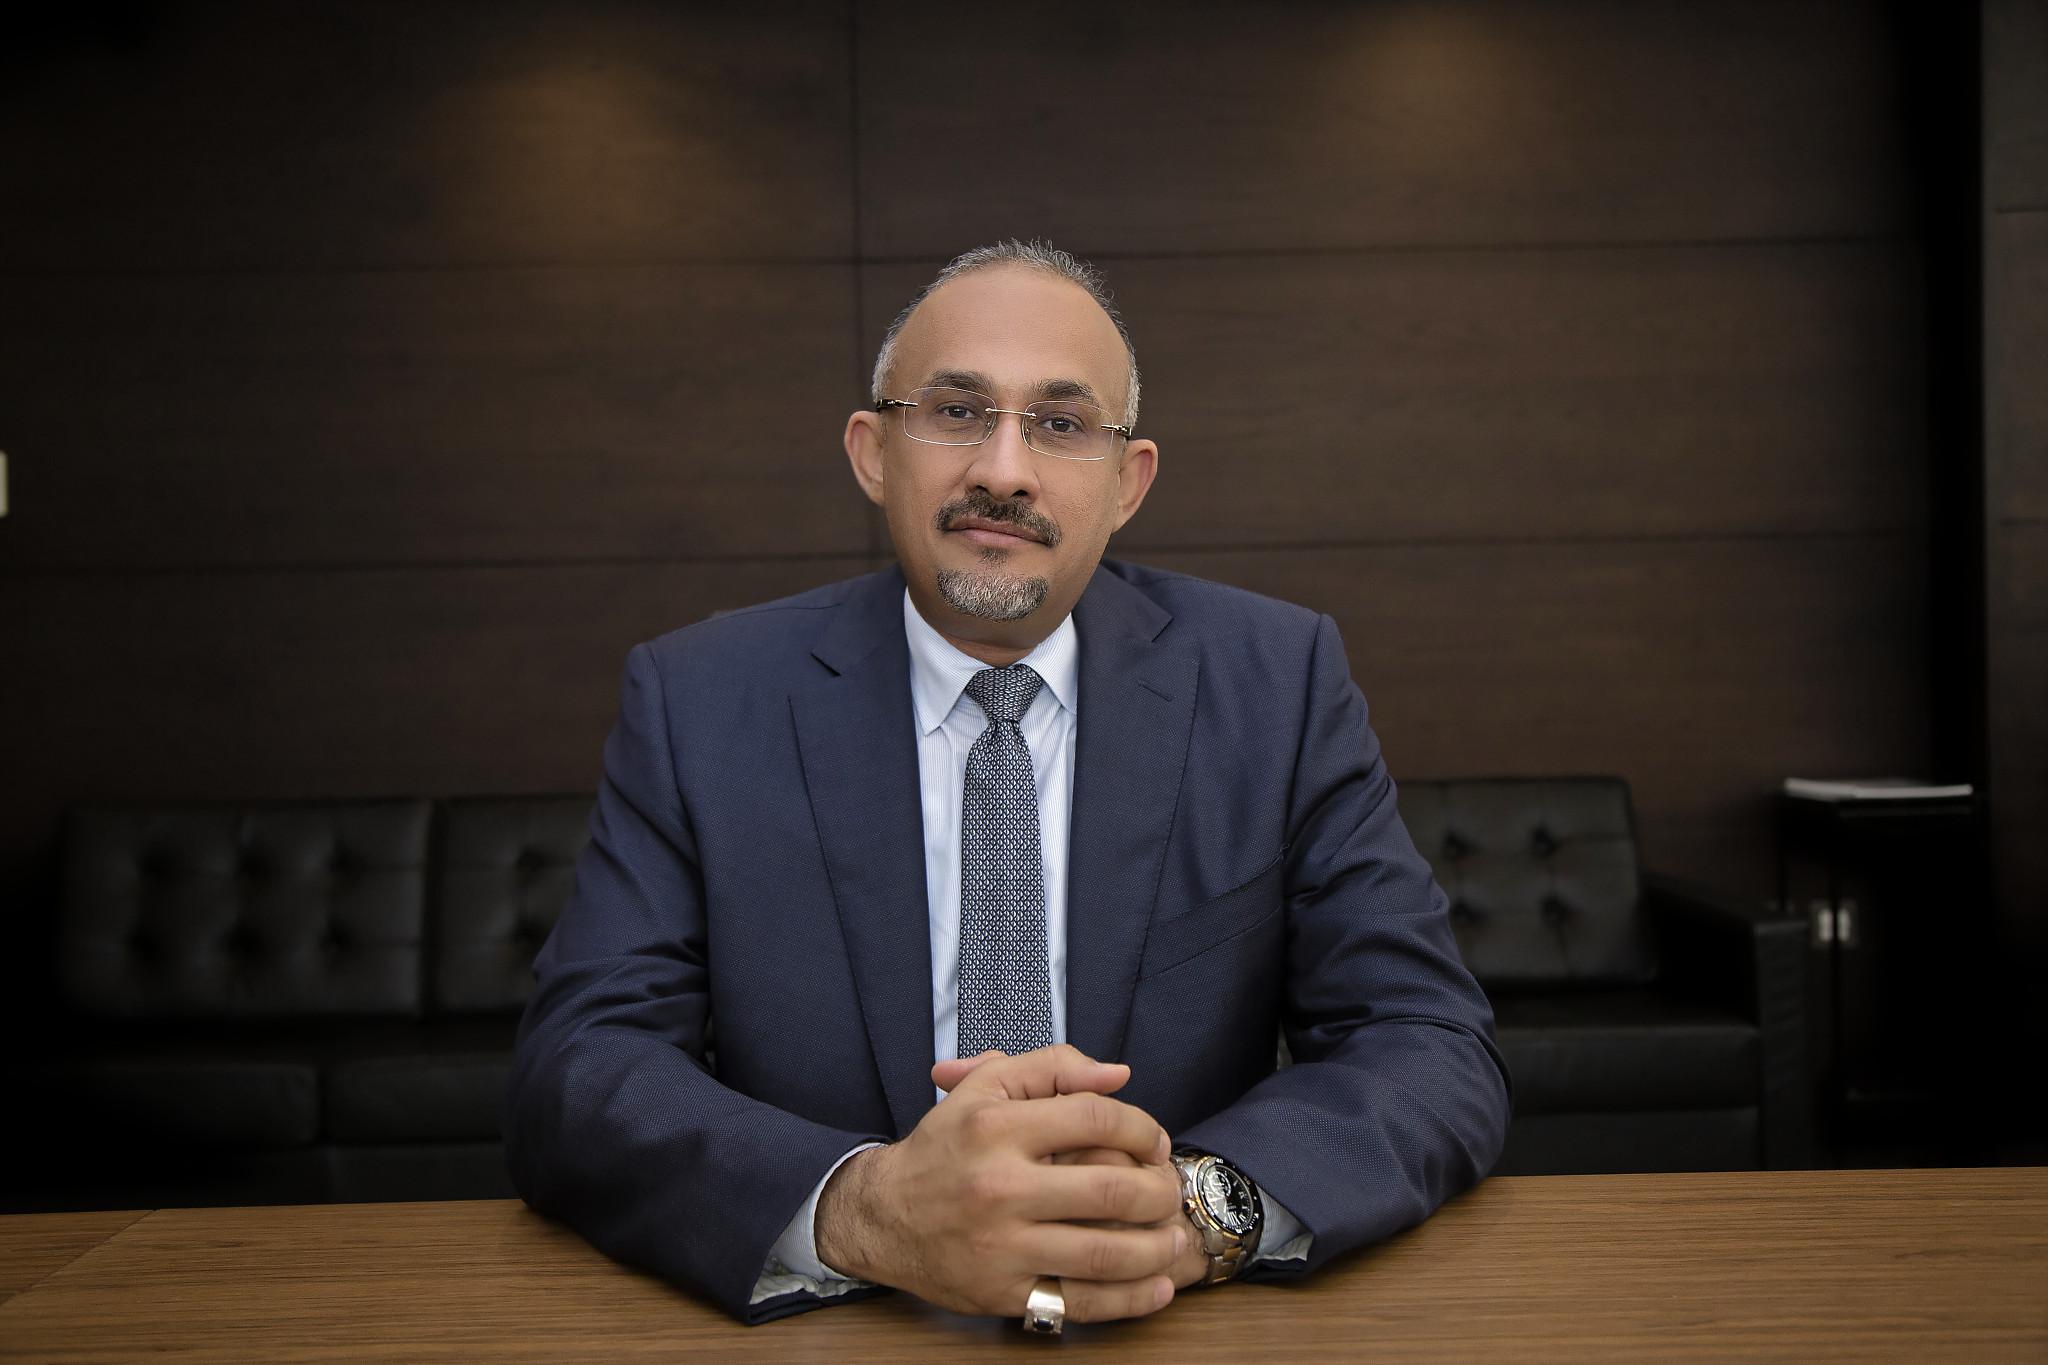 Khaled Al Wazir